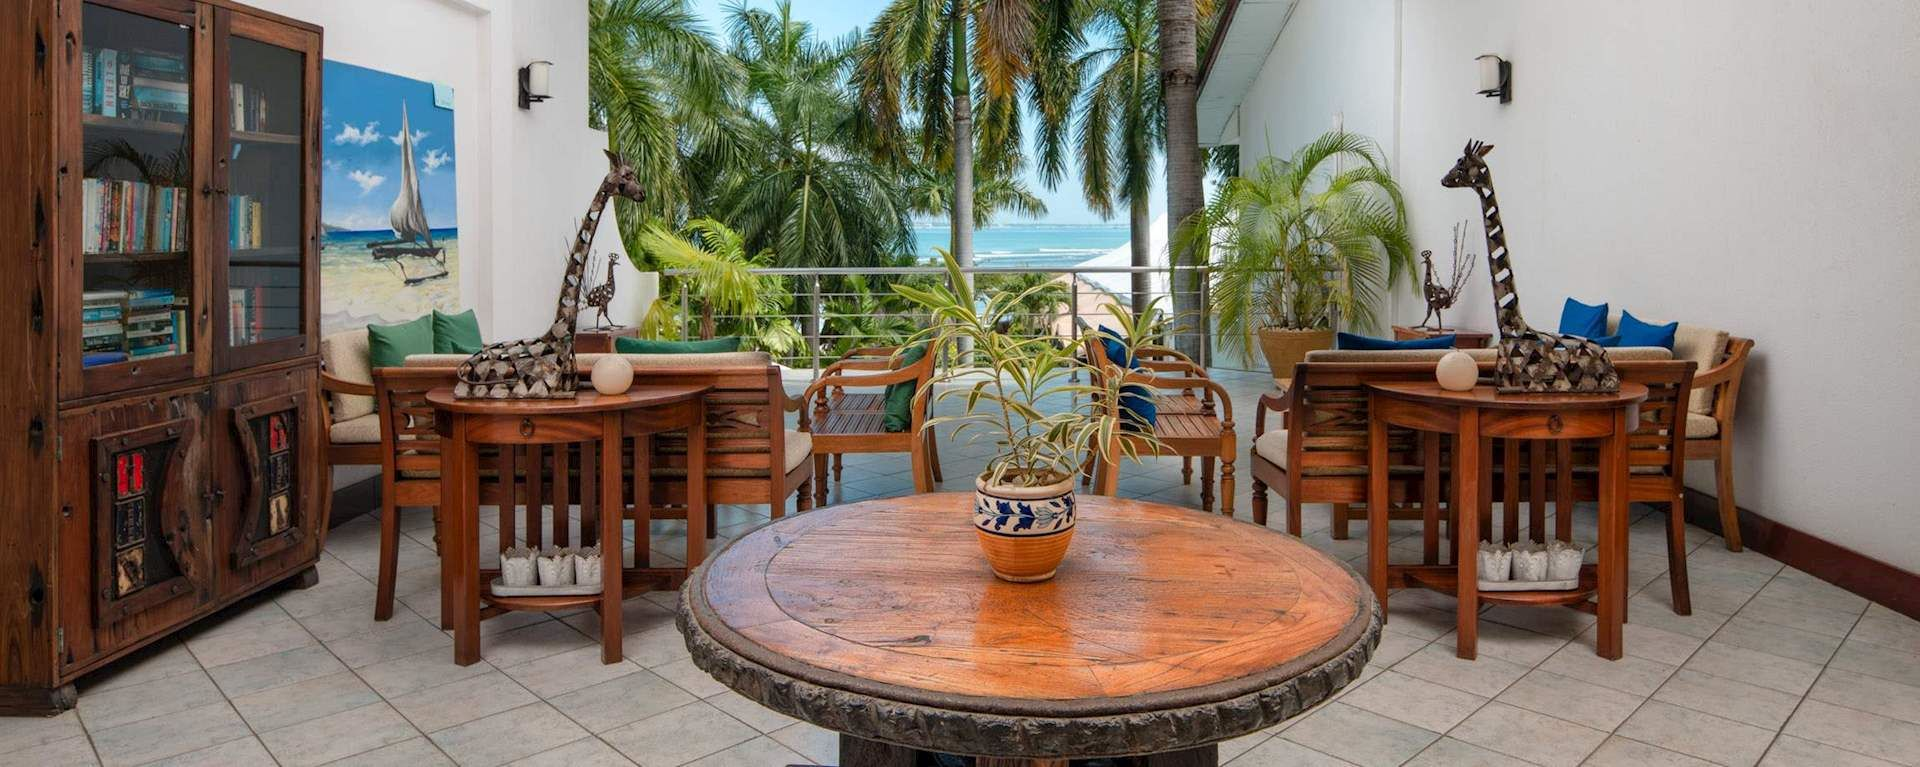 Best Western Coral Beach Hotel6